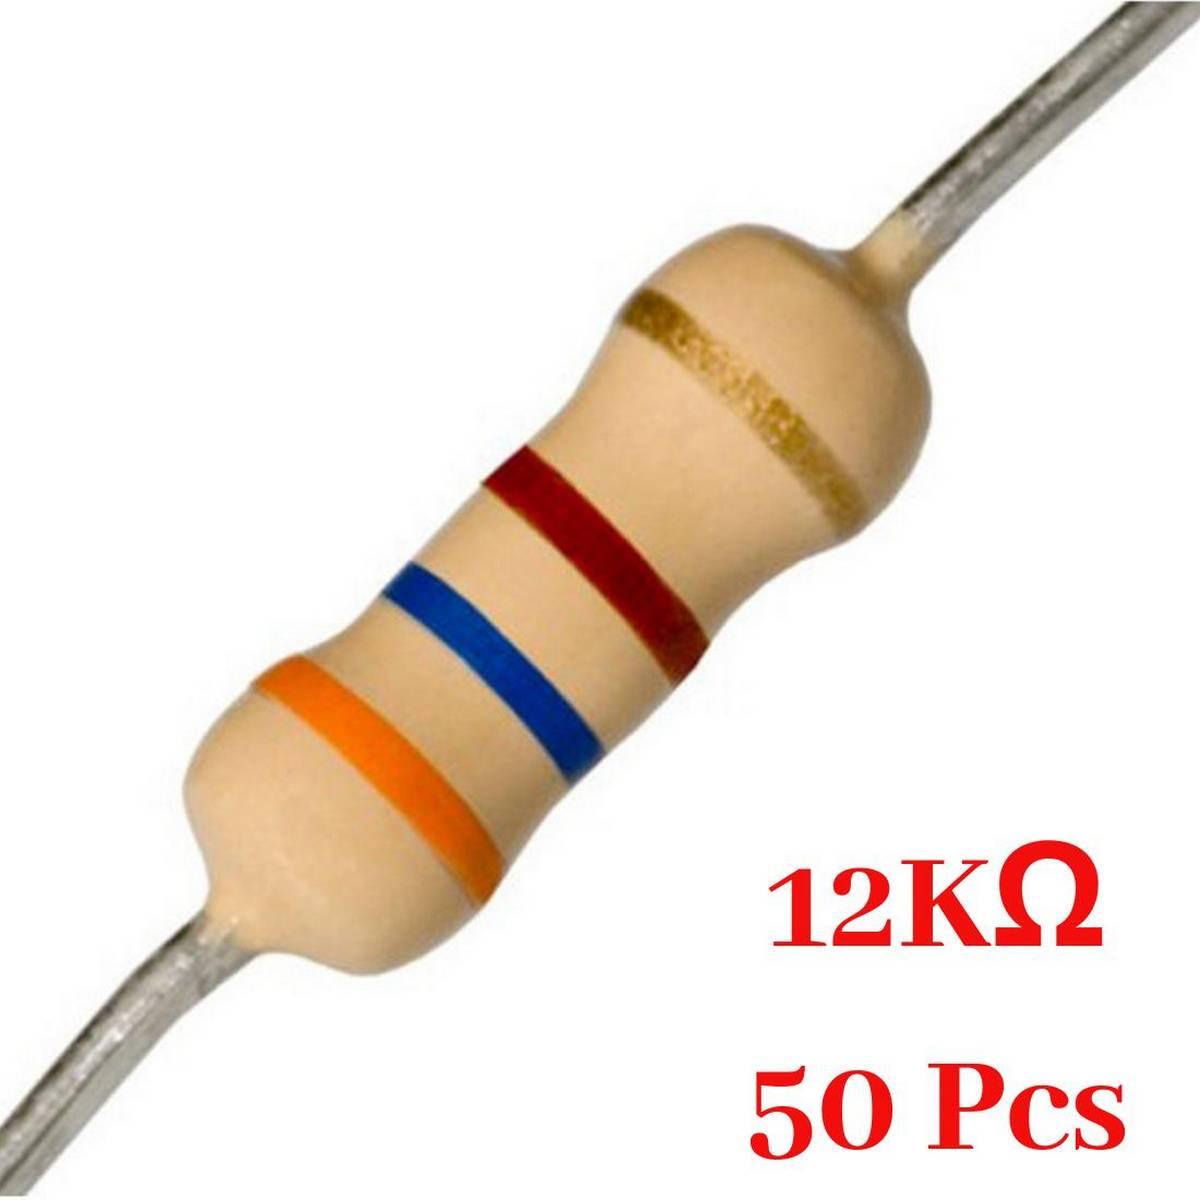 50 Pcs- 12K Ohm resistor